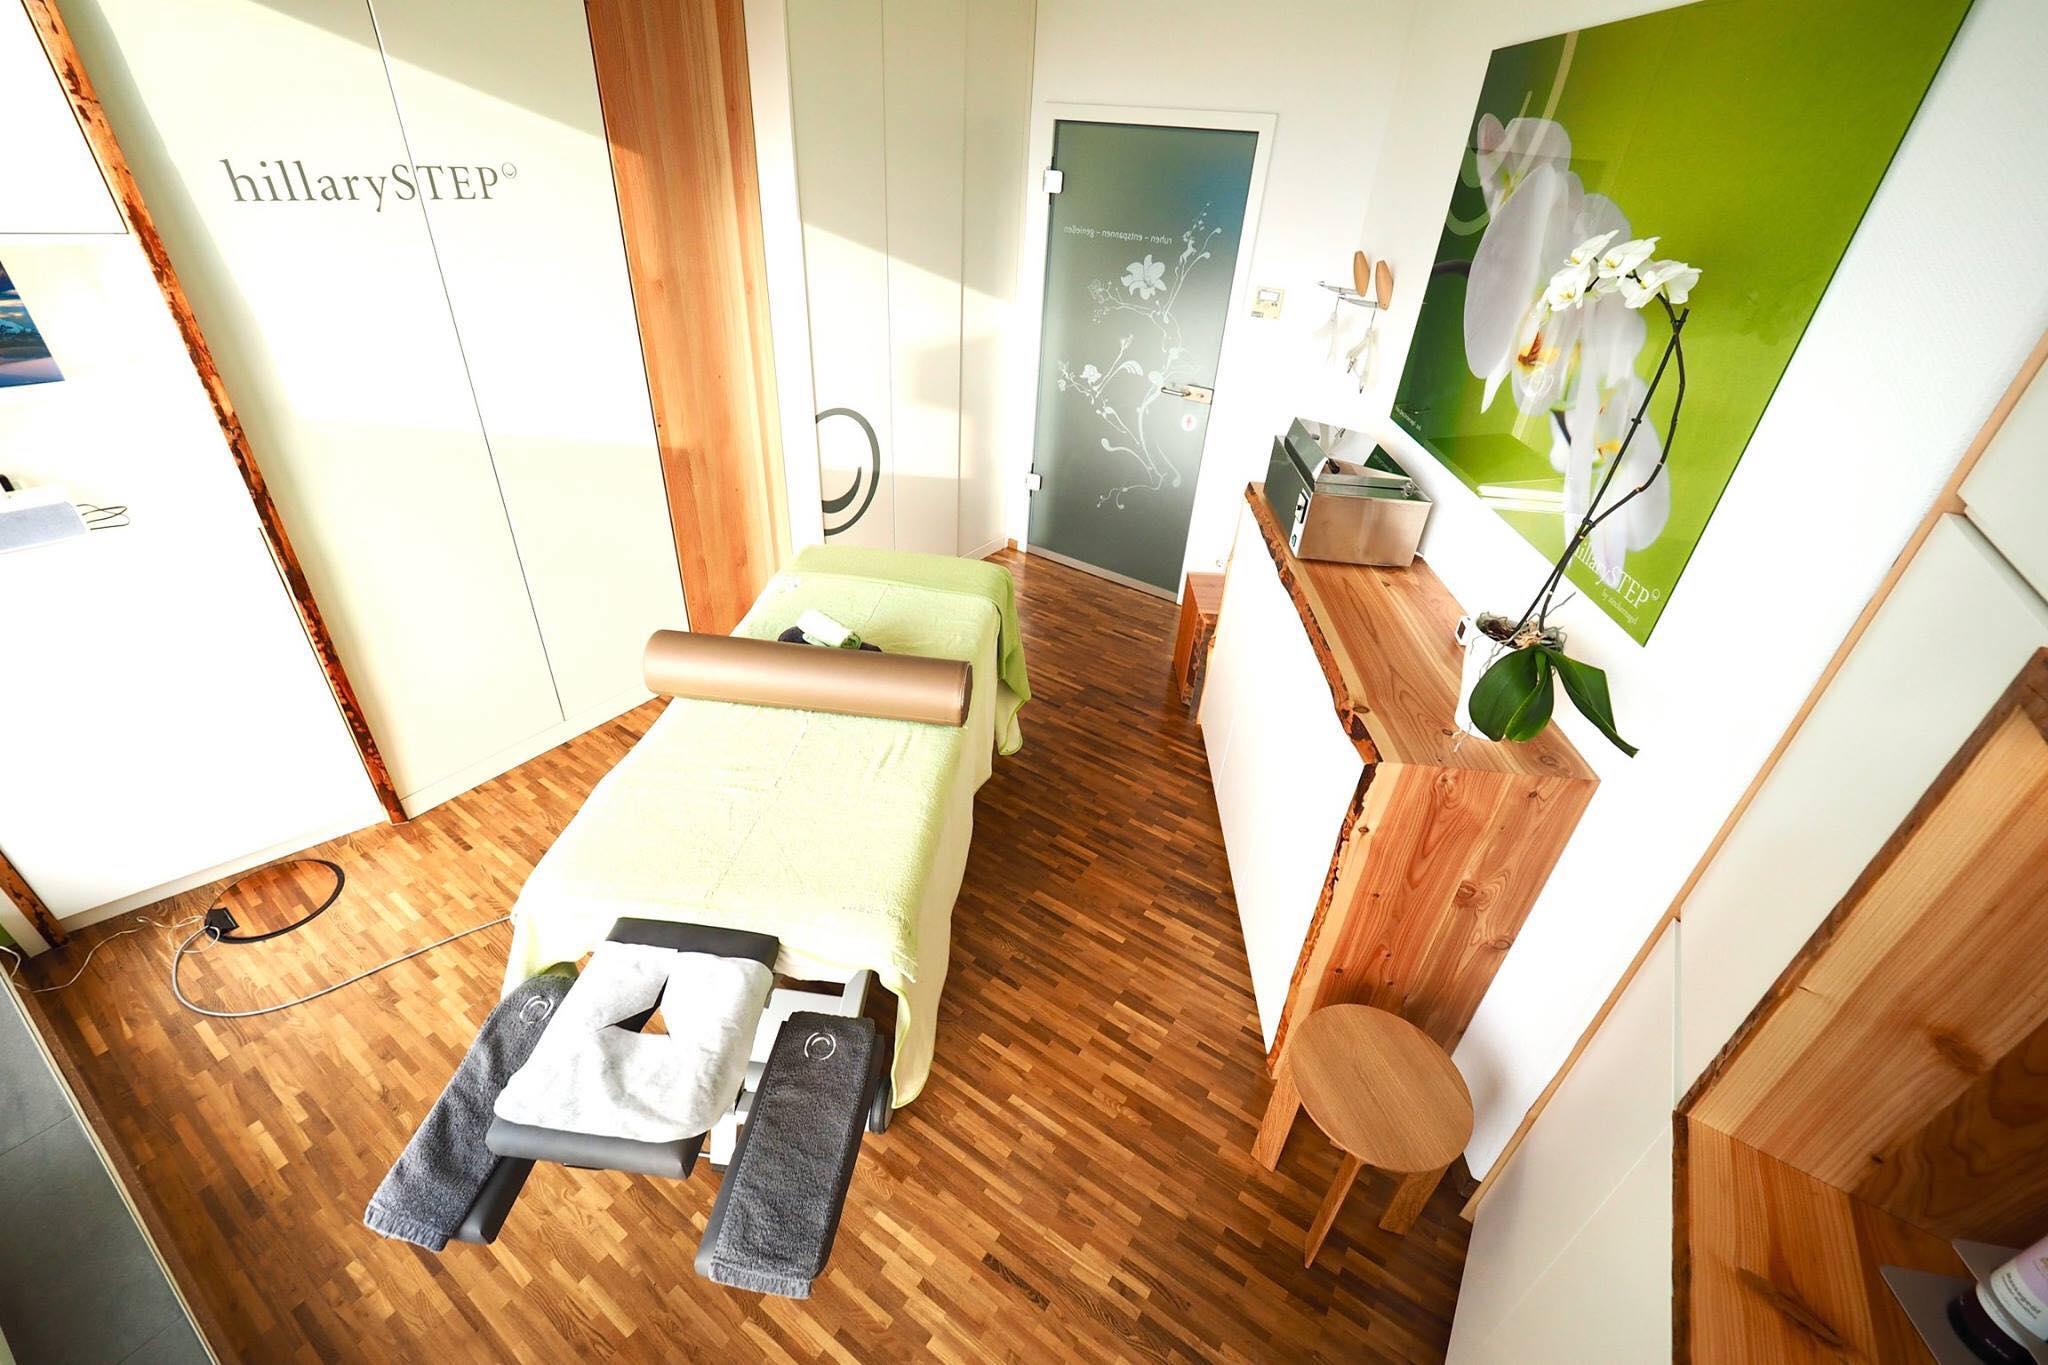 gesch ftsr ume gerber ingenieure gmbh aus freimersheim. Black Bedroom Furniture Sets. Home Design Ideas